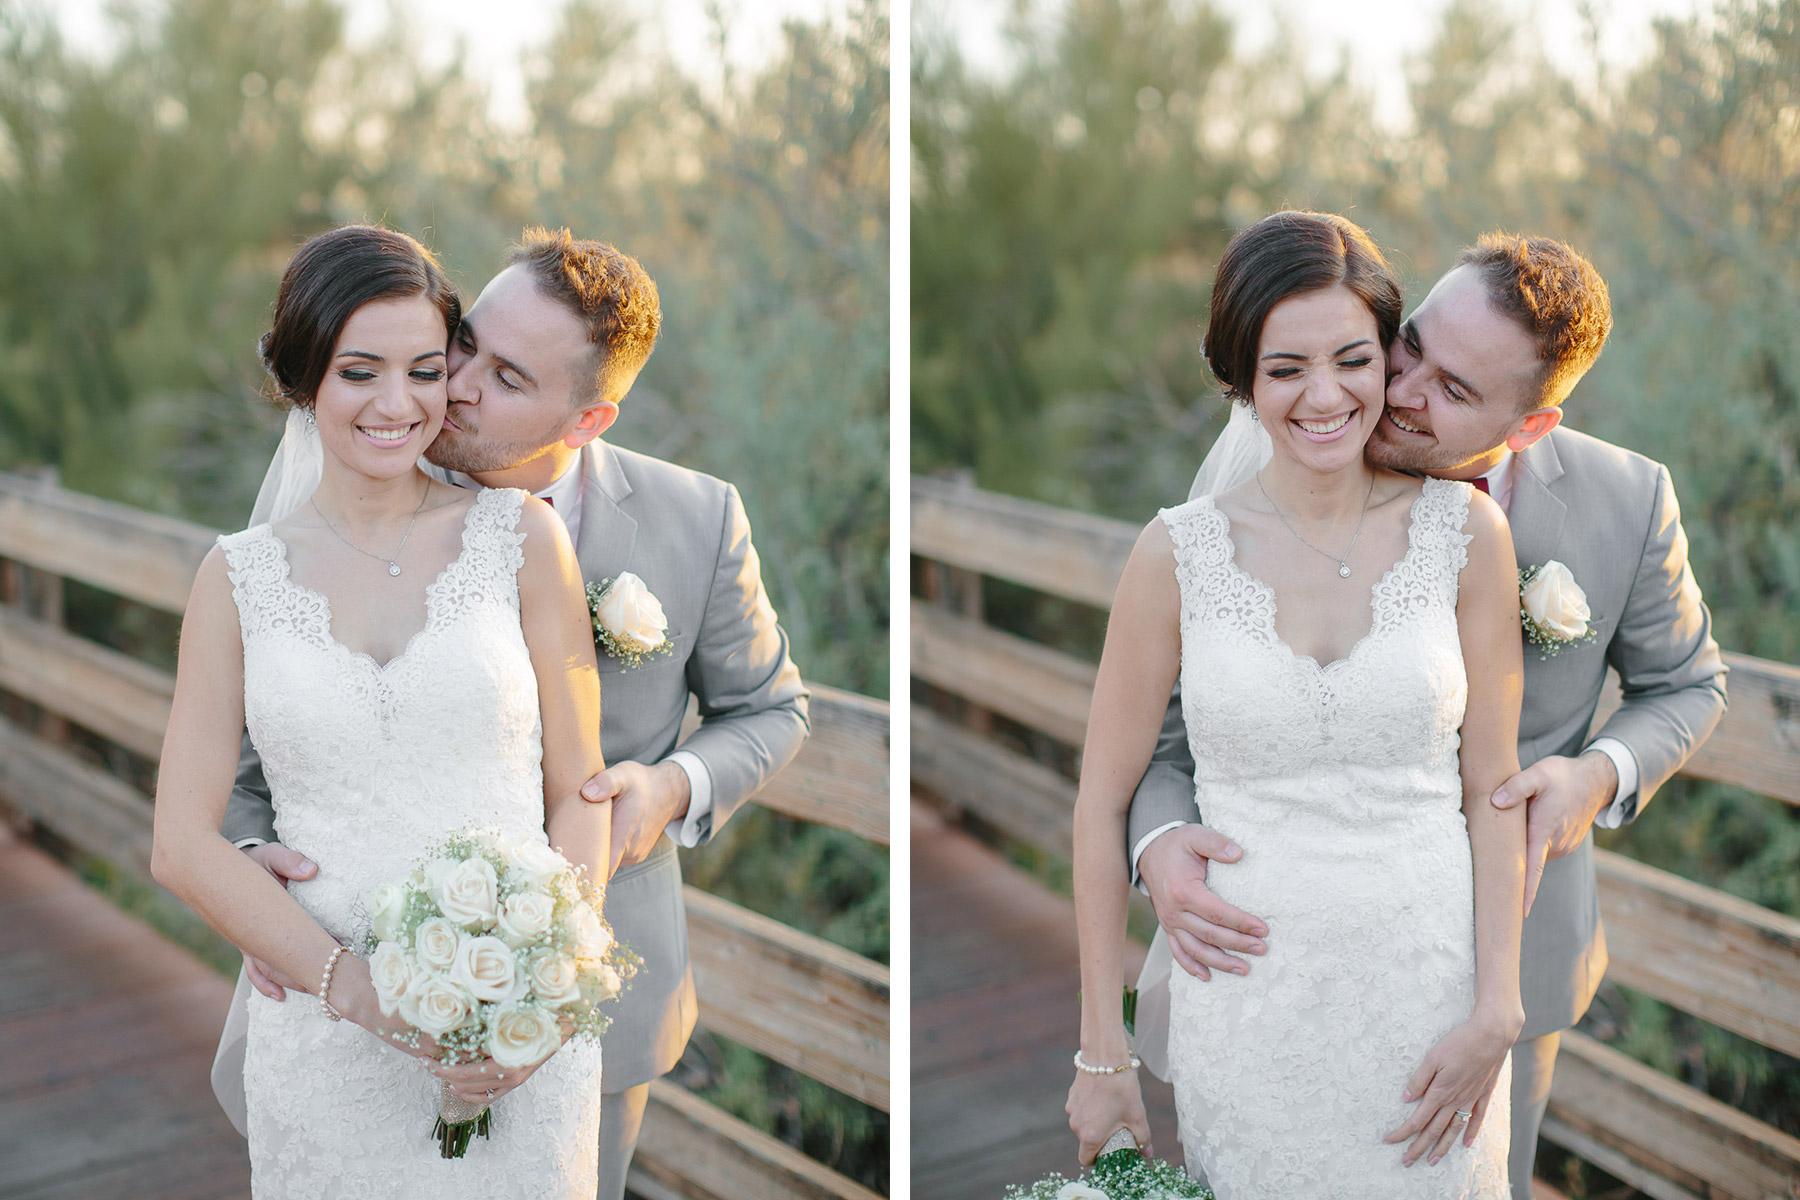 161210-Luxium-Weddings-Arizona-Matt-Jenny-Anthem-Golf-Country-Club-1057a.jpg